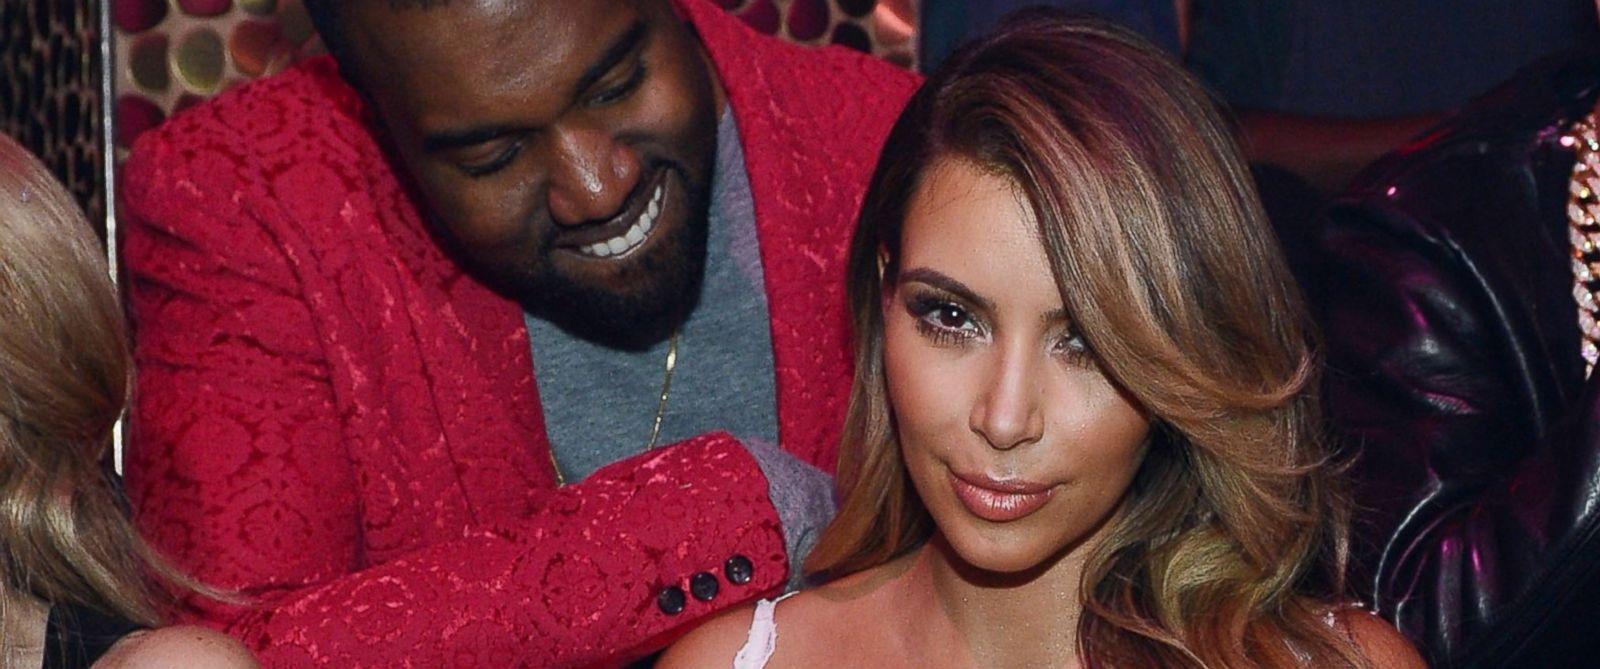 PHOTO: Kanye West and Kim Kardashian celebrate Kim Kardashians 33rd birthday at Tao Las Vegas on October 25, 2013 in Las Vegas, Nevada.